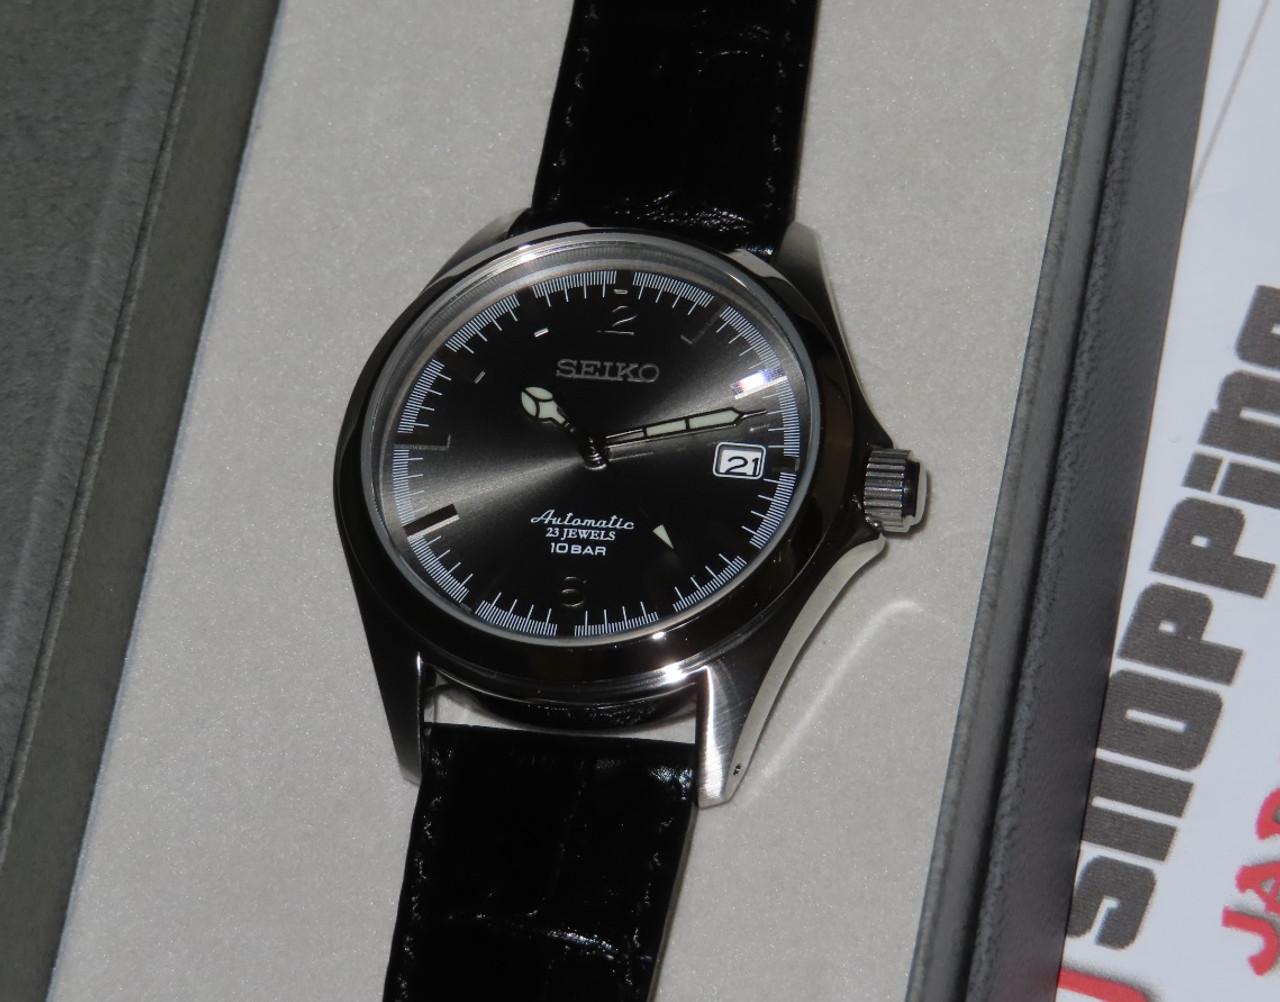 Seiko x TiCTAC Grey Sunburst SZSB007 Special Edition